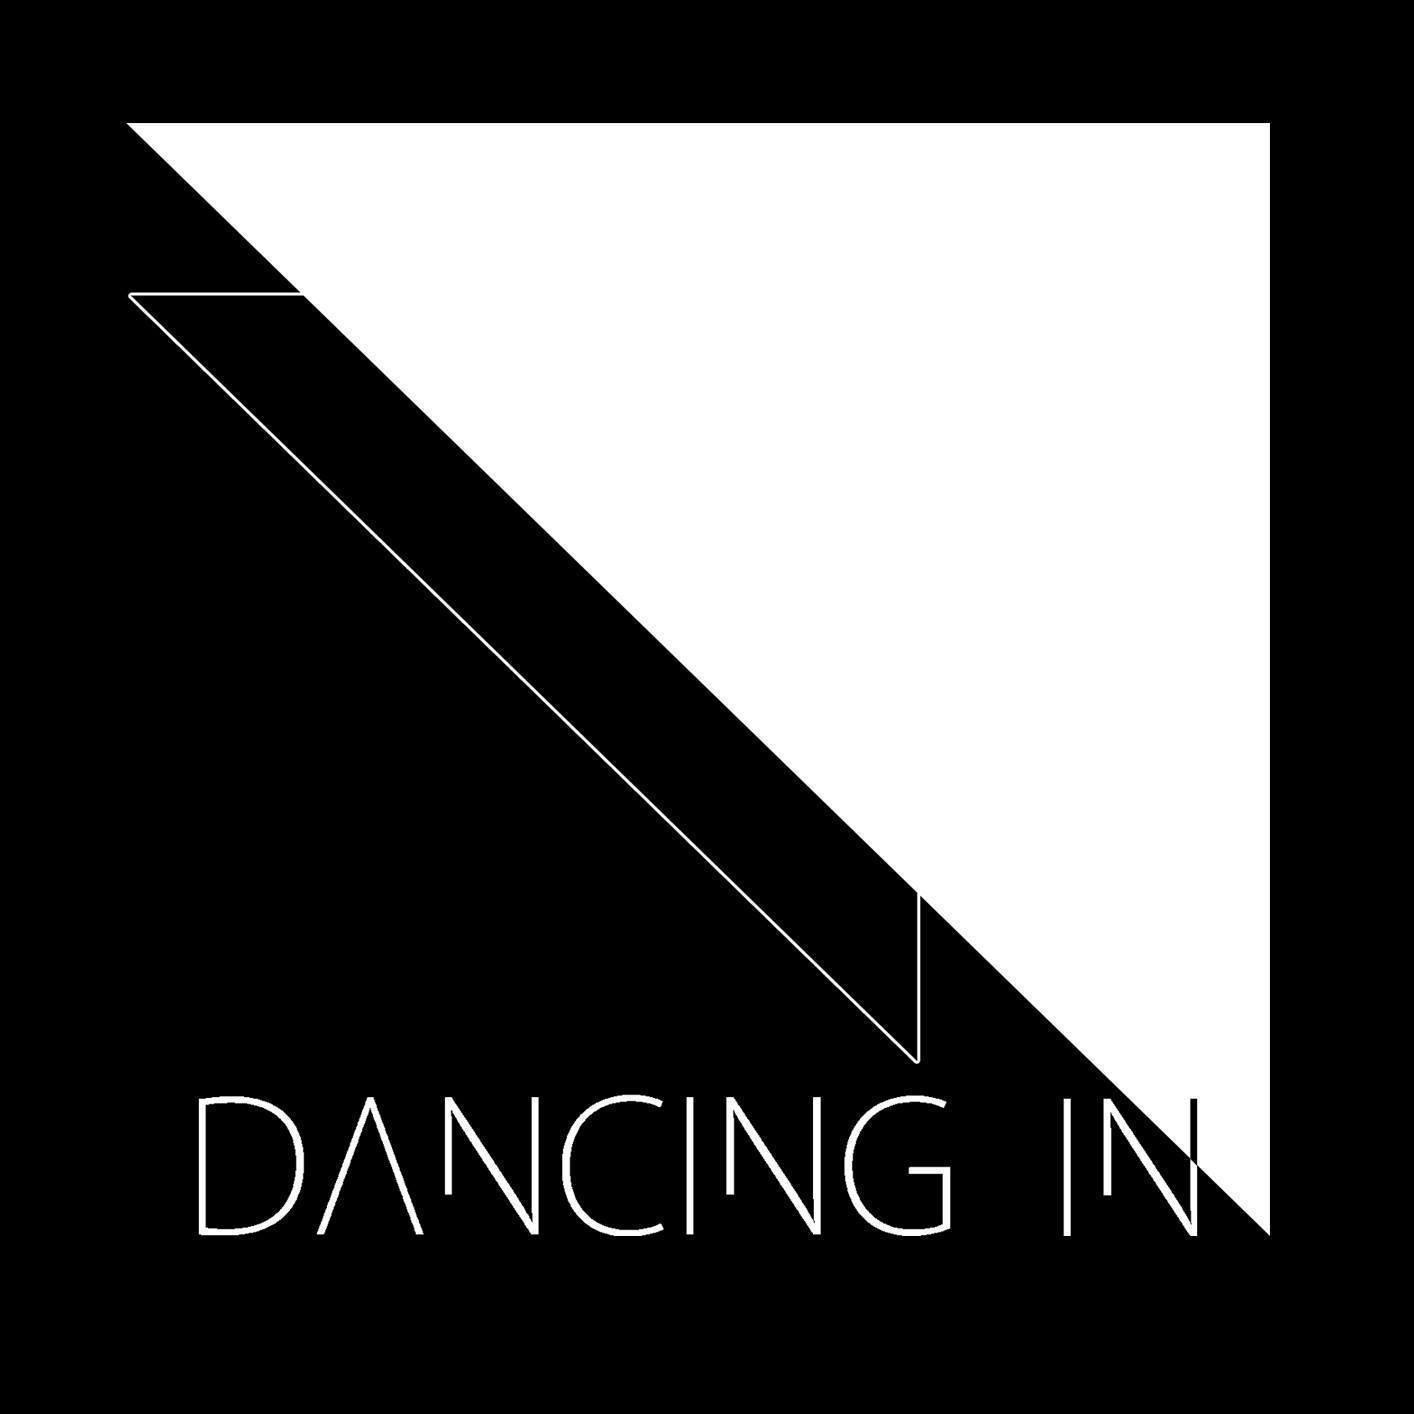 Profil Dancing In radio shows. Kanal Tv